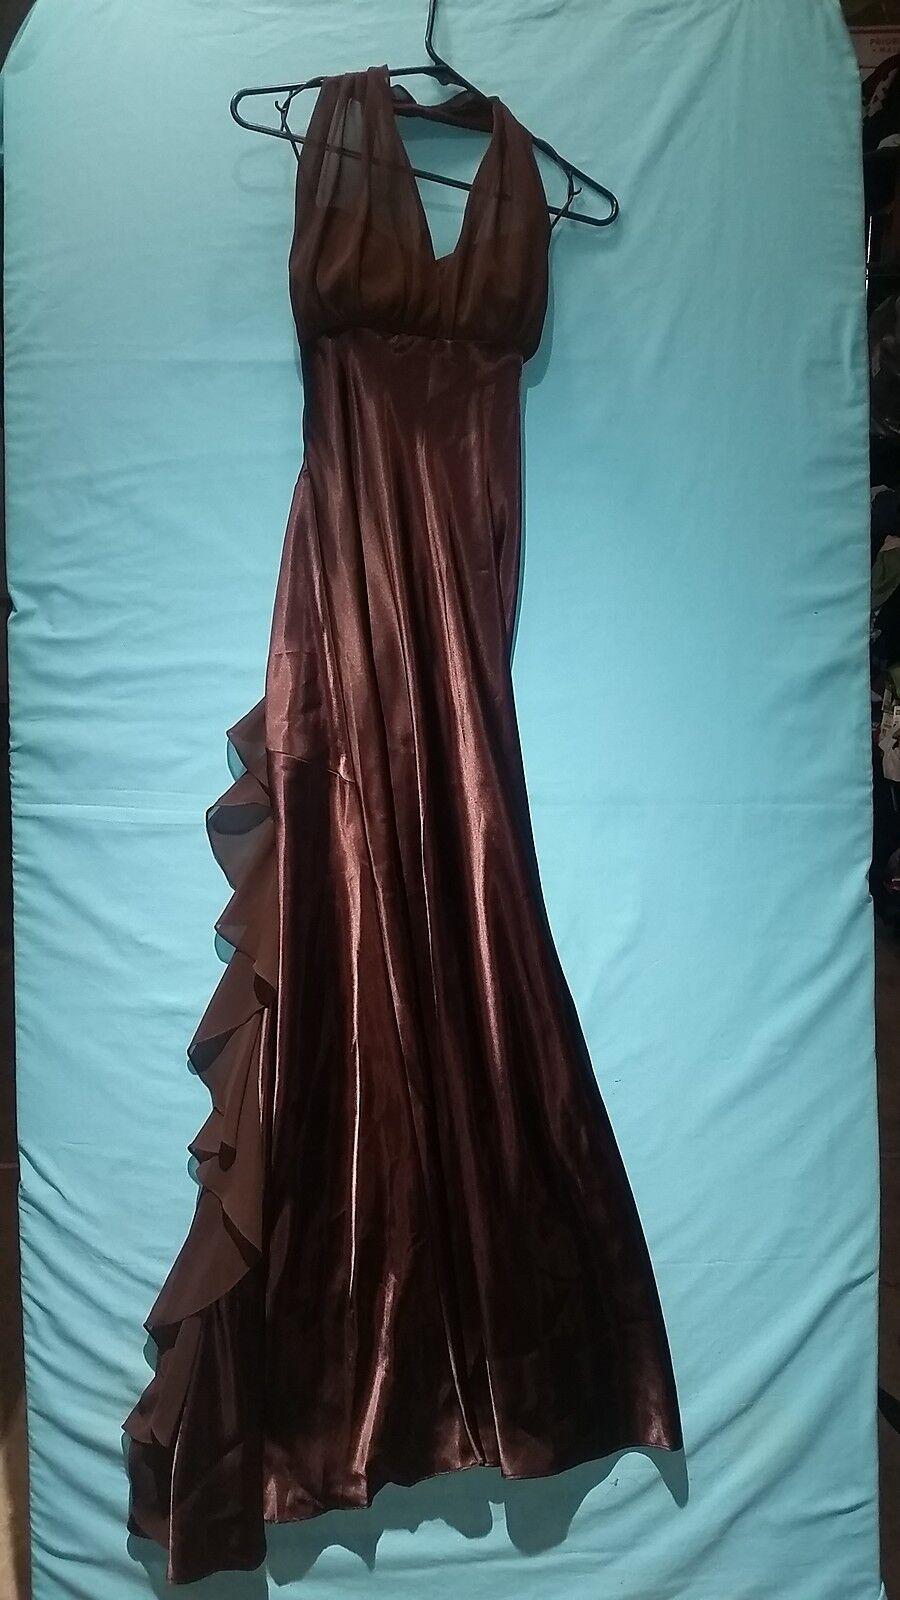 David's Bridal Elegant Brown Full Length Beautiful Dress with Slip size 4